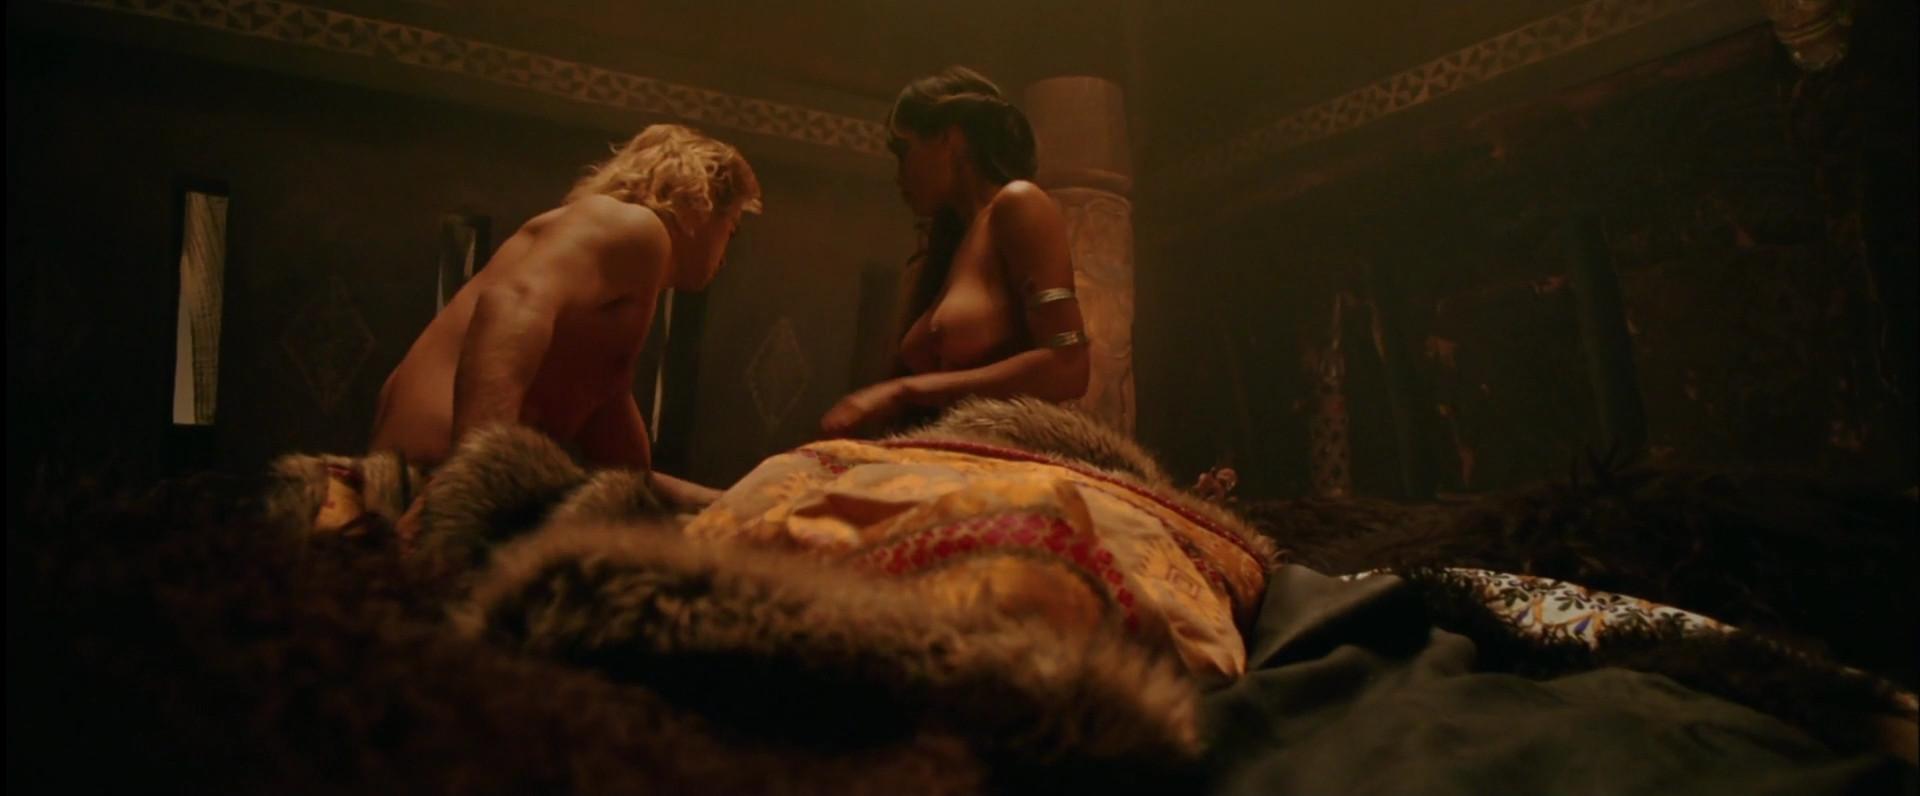 Alexander movie sex scene